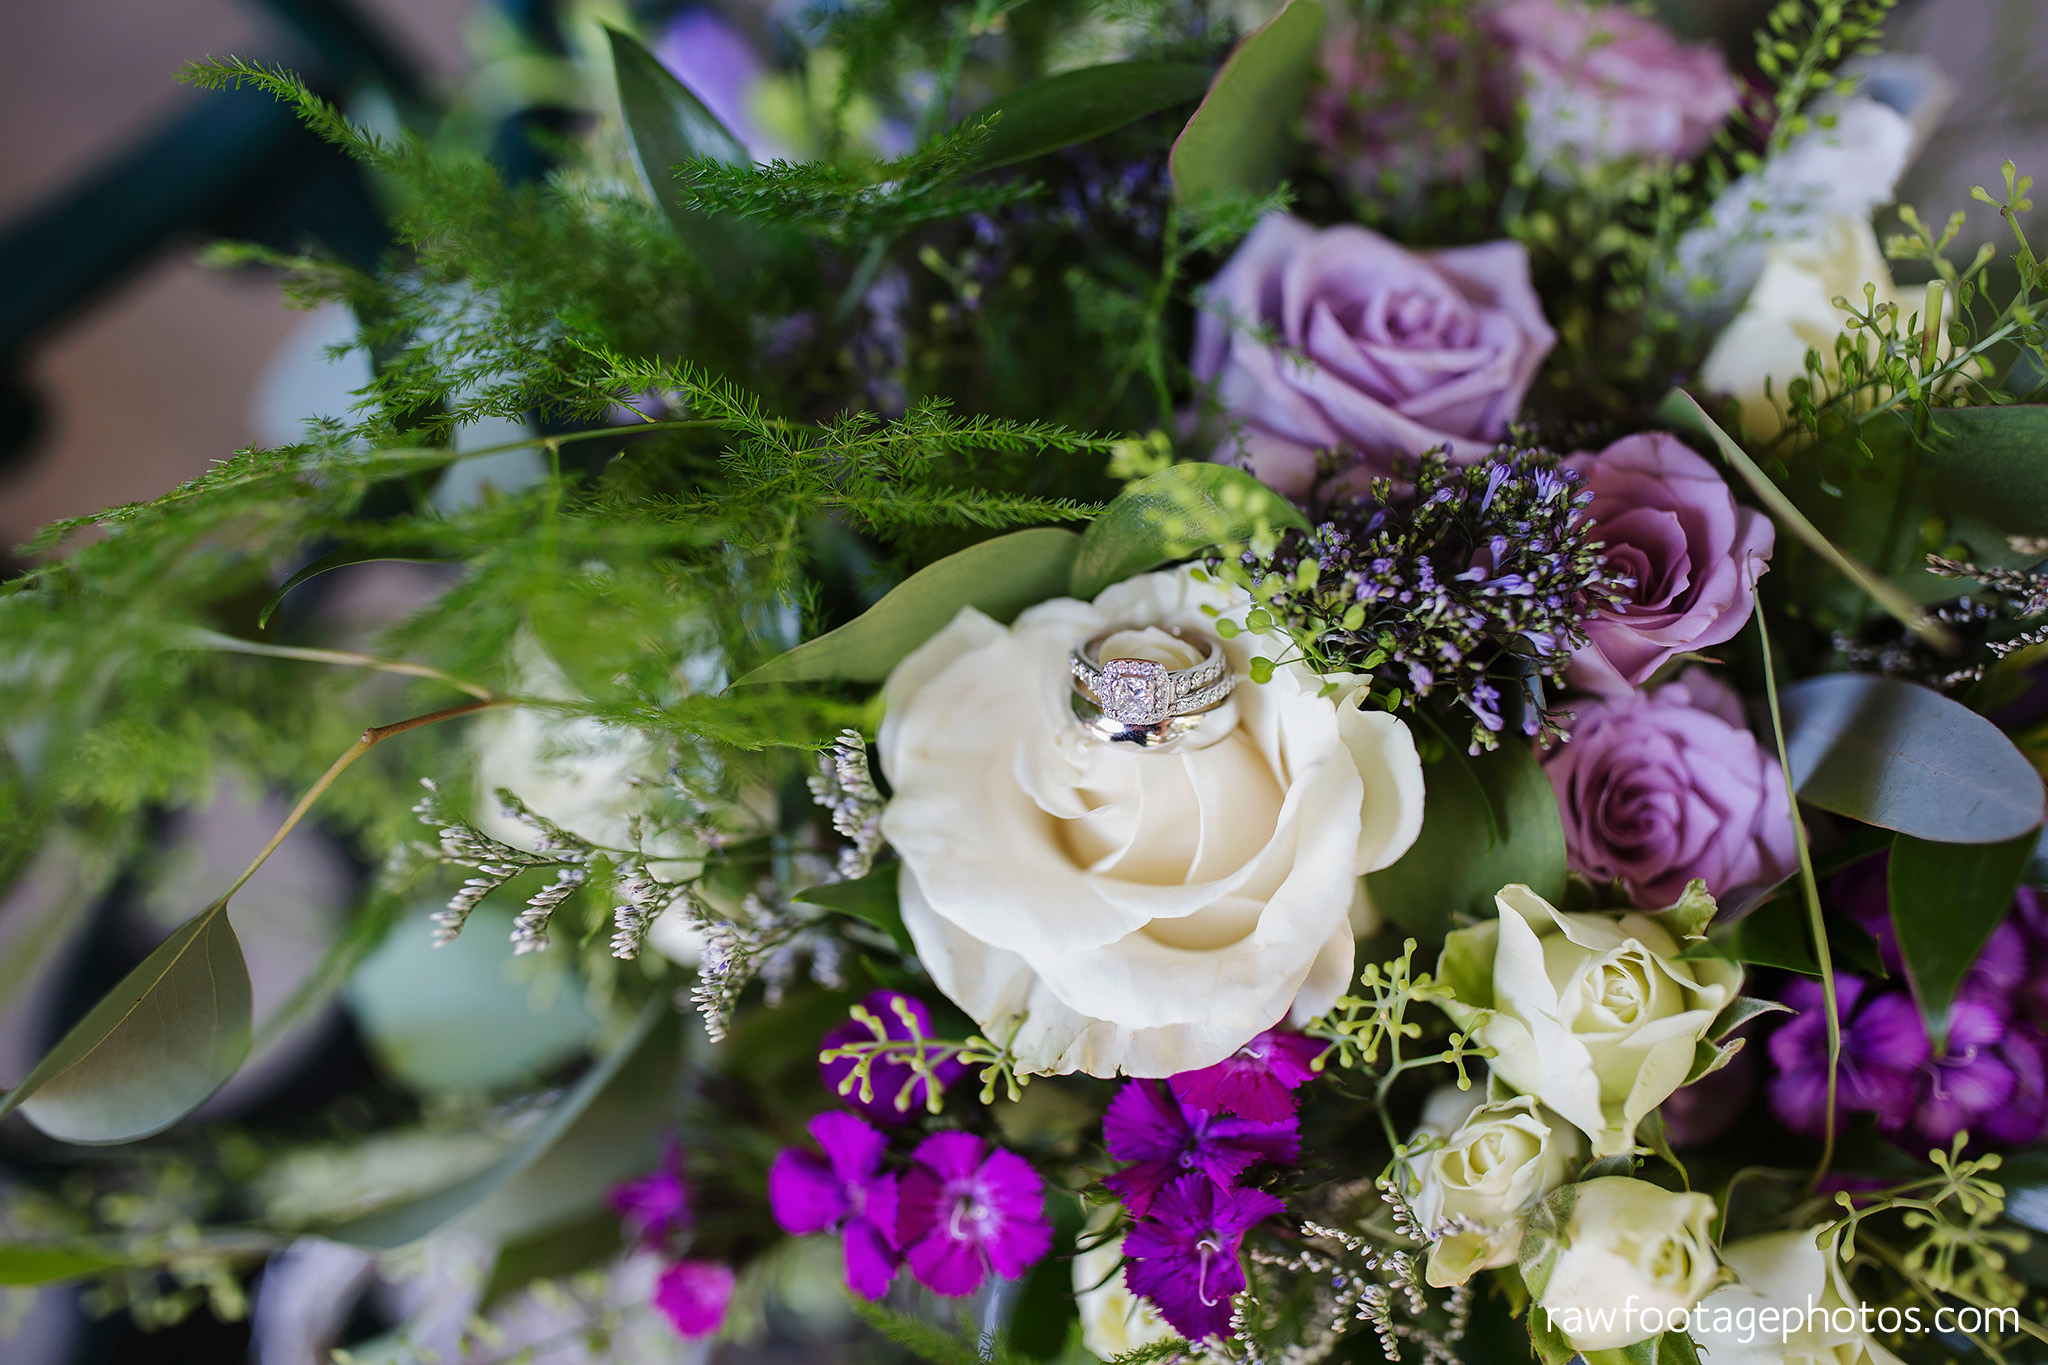 london_ontario_wedding_photographer-grand_bend_wedding_photographer-oakwood_resort_wedding-beach_wedding-sunset_wedding-raw_footage_photography013.jpg